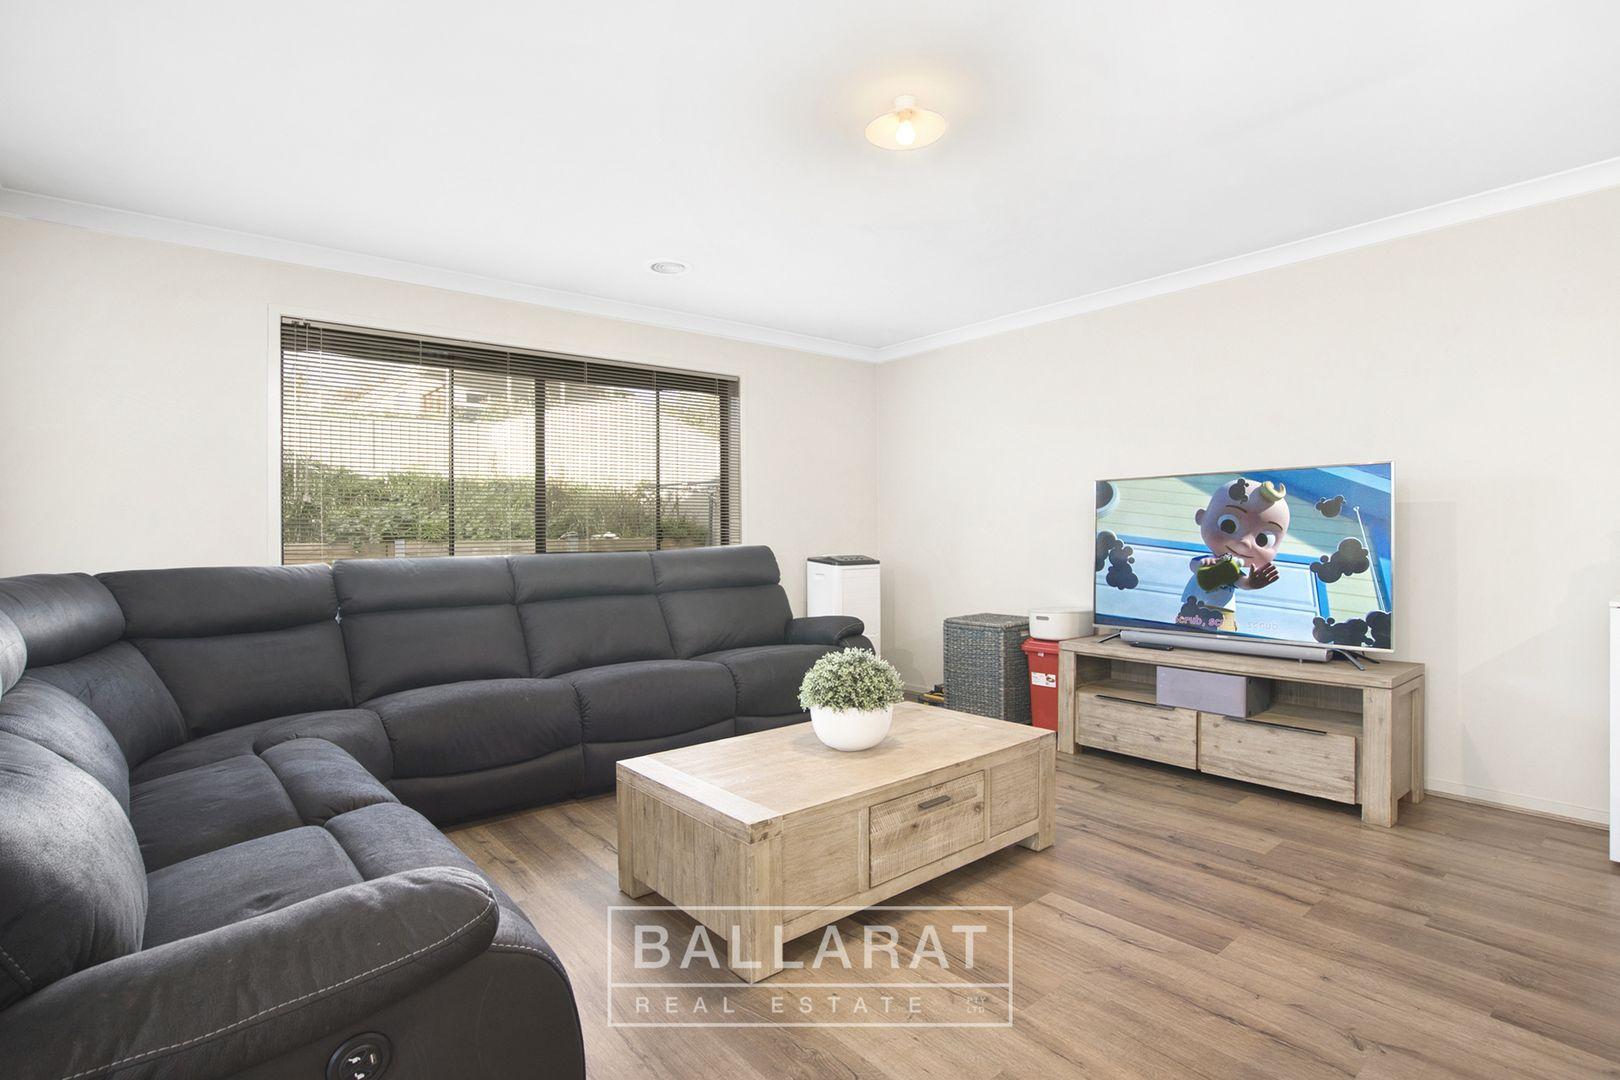 8 Gordon Street, Ballarat East VIC 3350, Image 2